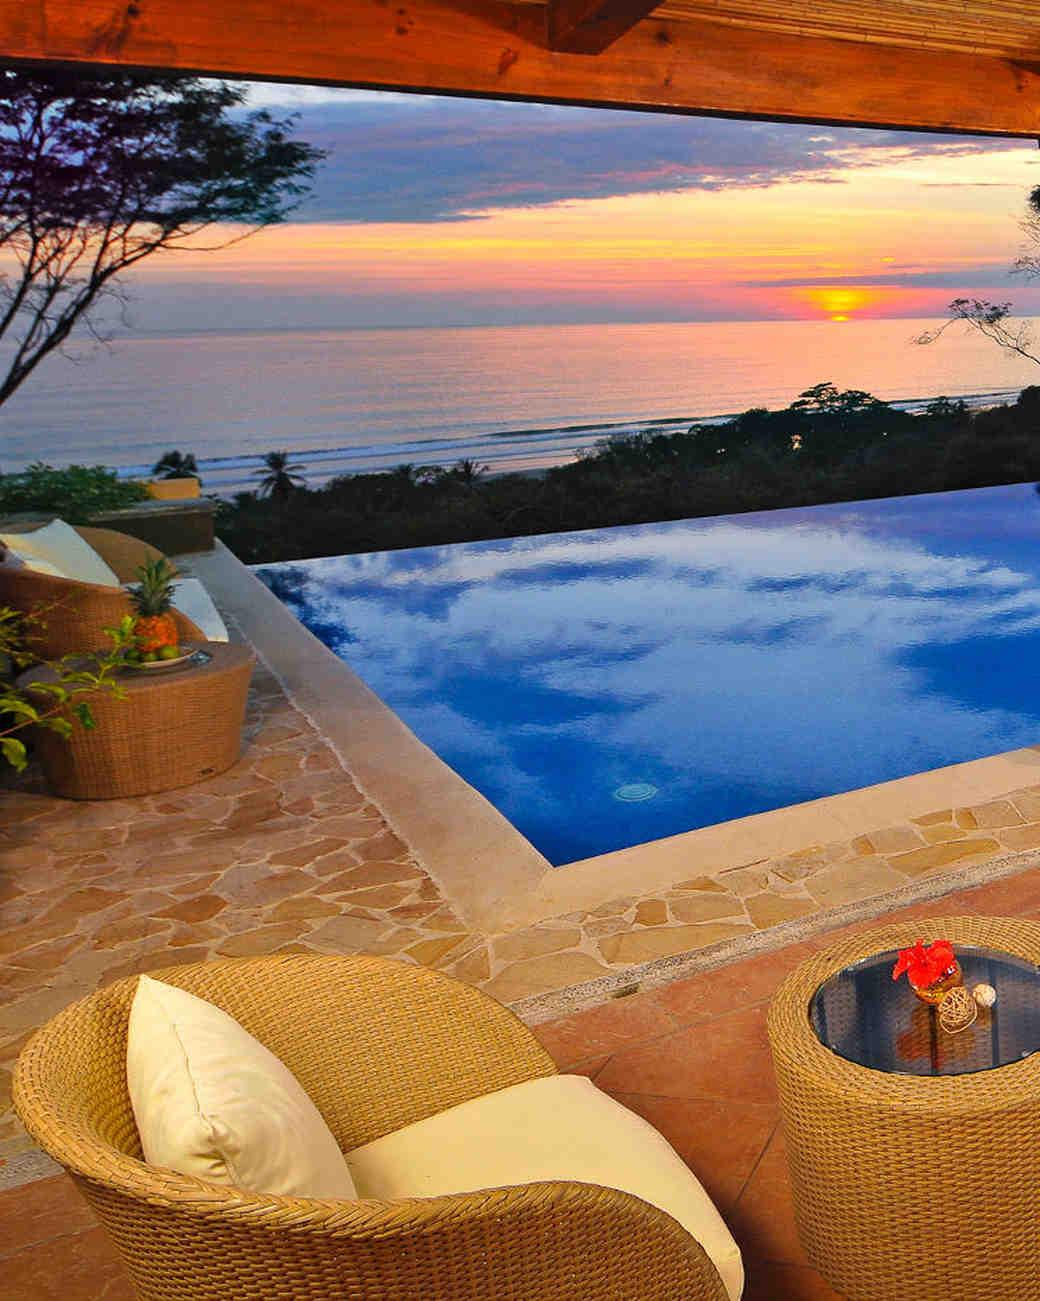 airbnb-wedding-venues-dominical-puntarenas-costa-rica-0515.jpg